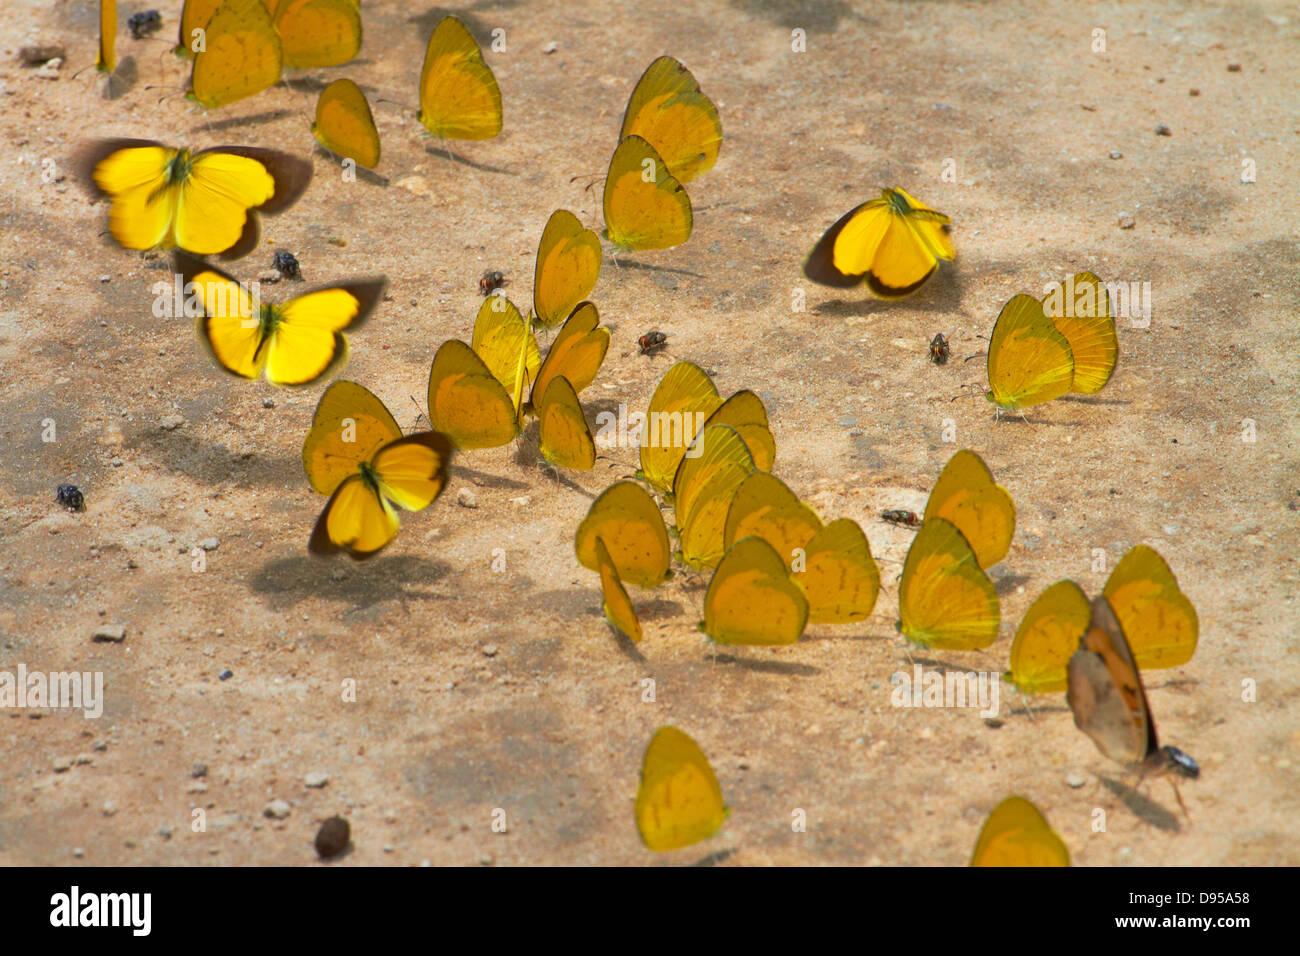 Papillons jaune sur chemin de terre, Botswana, Africa Photo Stock